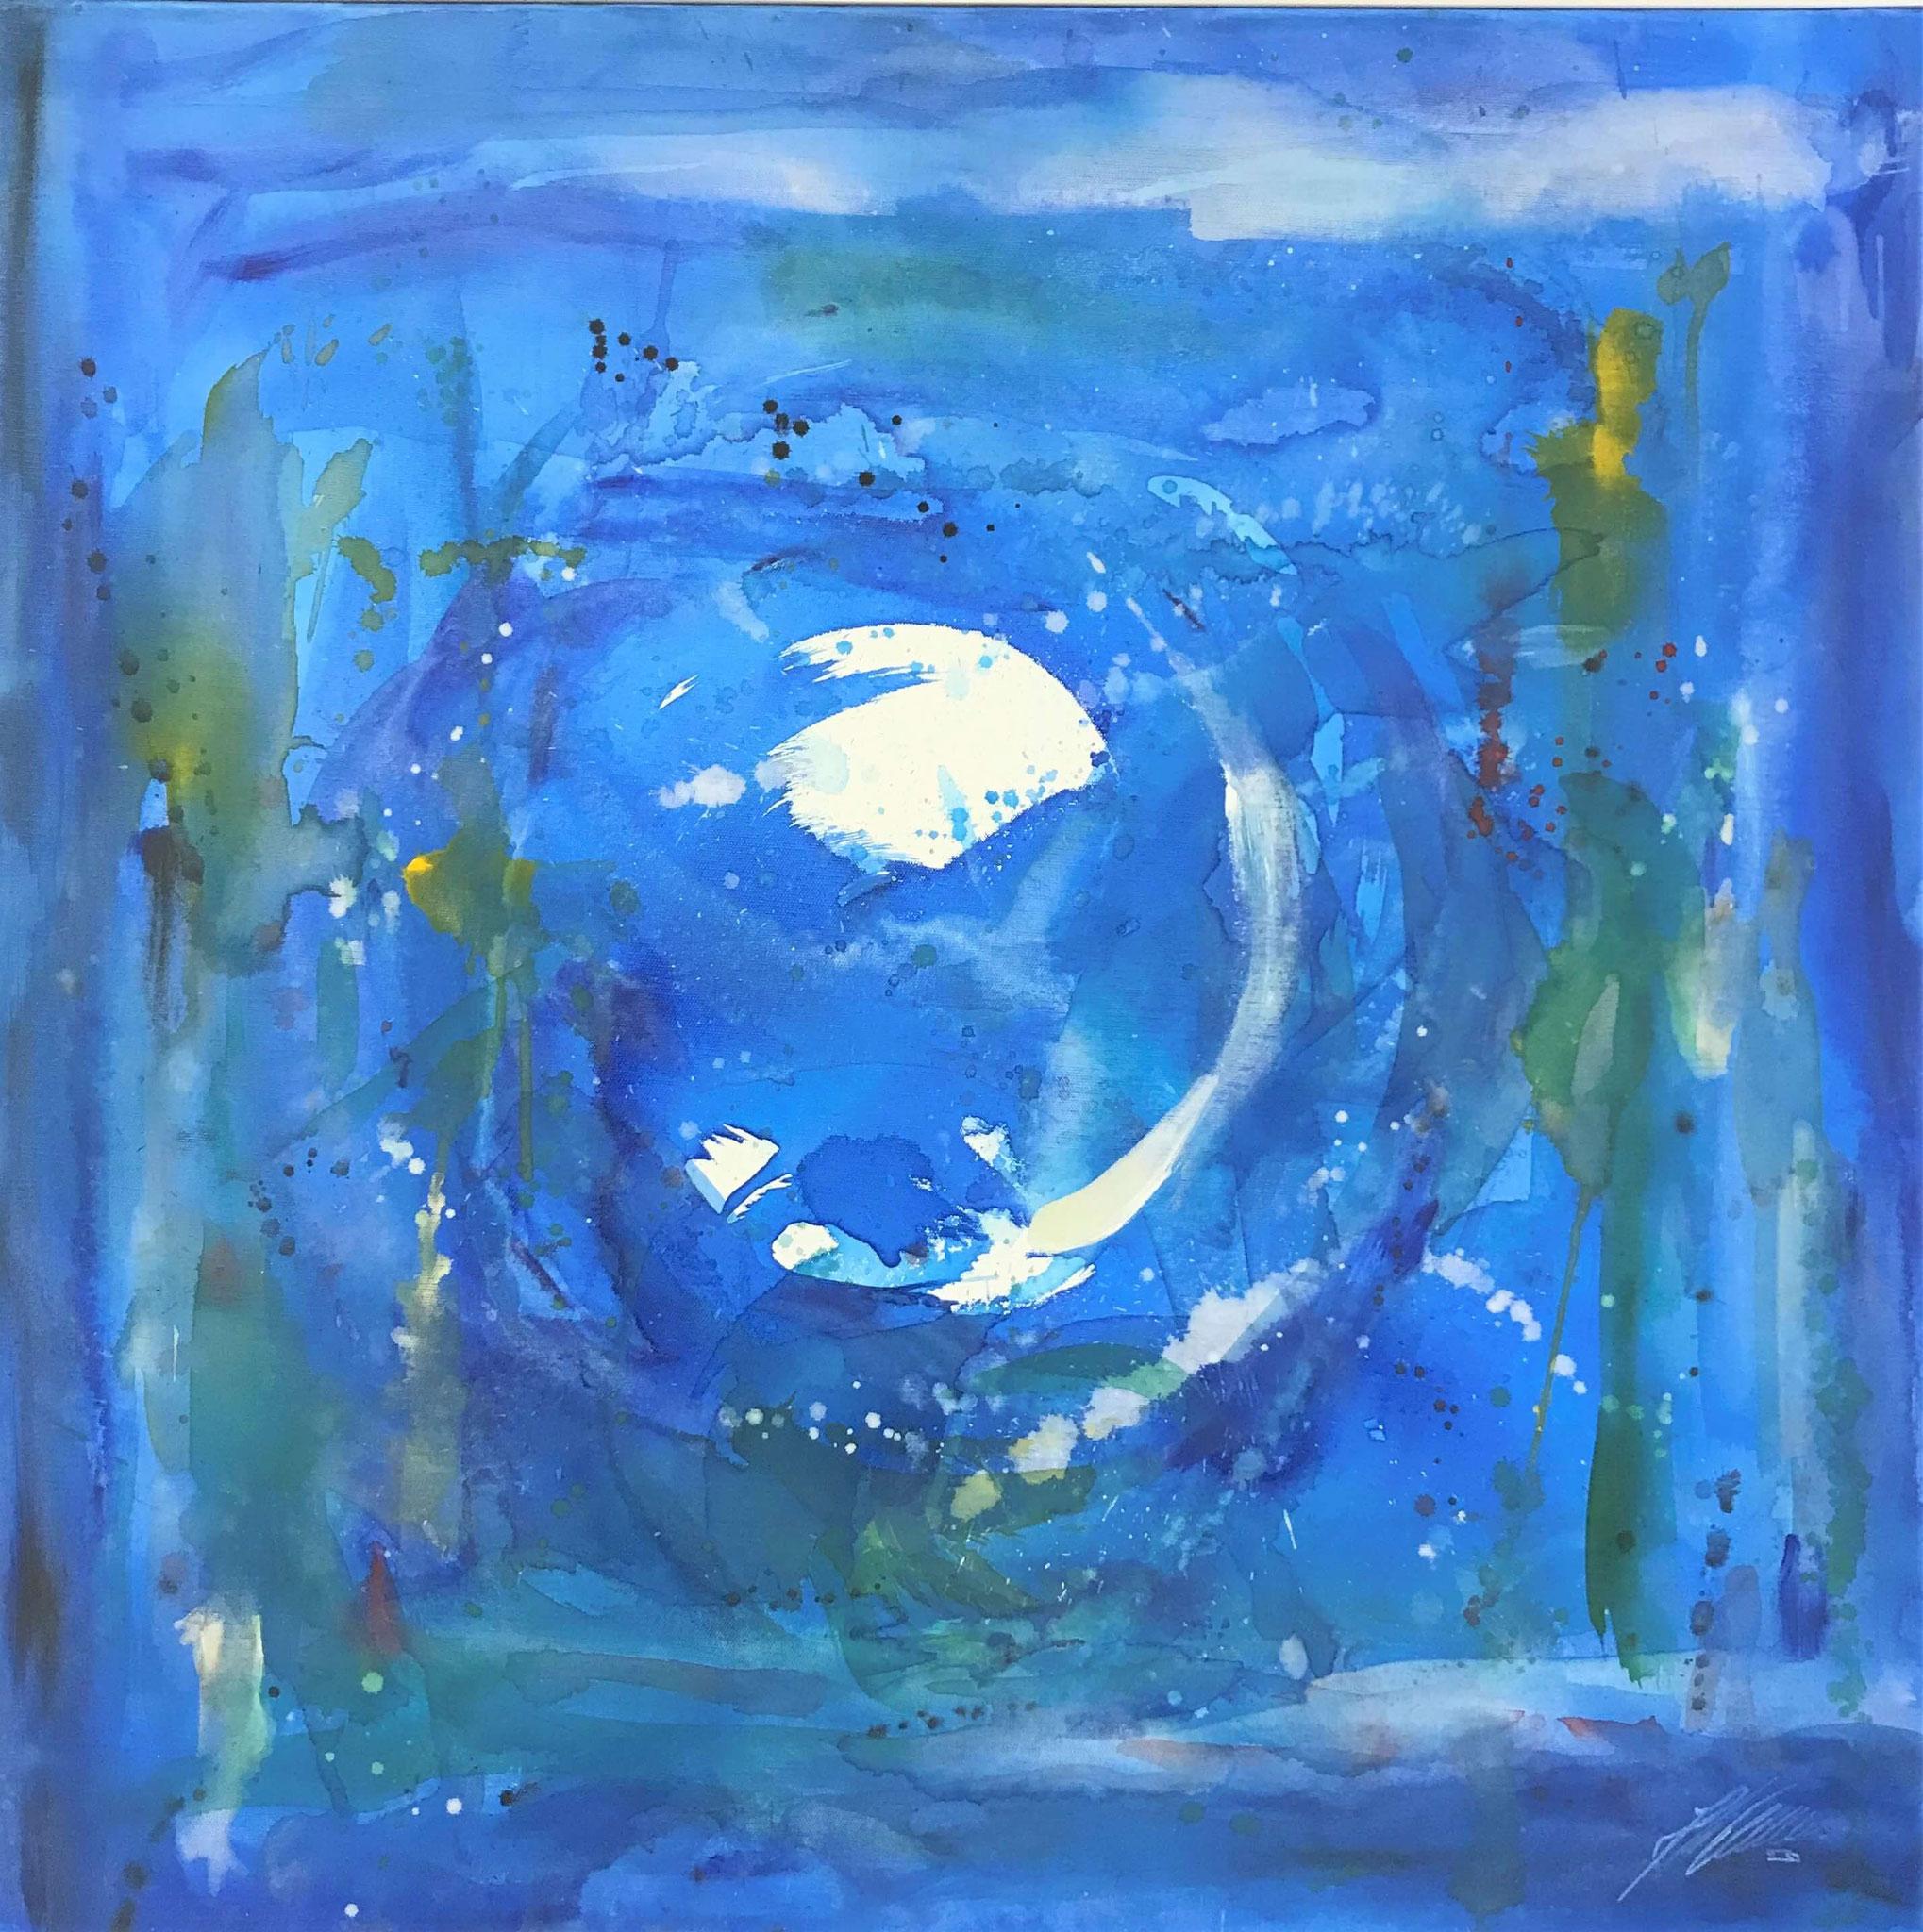 "Fr. 580.00 ""Krebs, Serie abstract"" Acryl auf Leinwand mit Rahmen 80 x 80 cm."